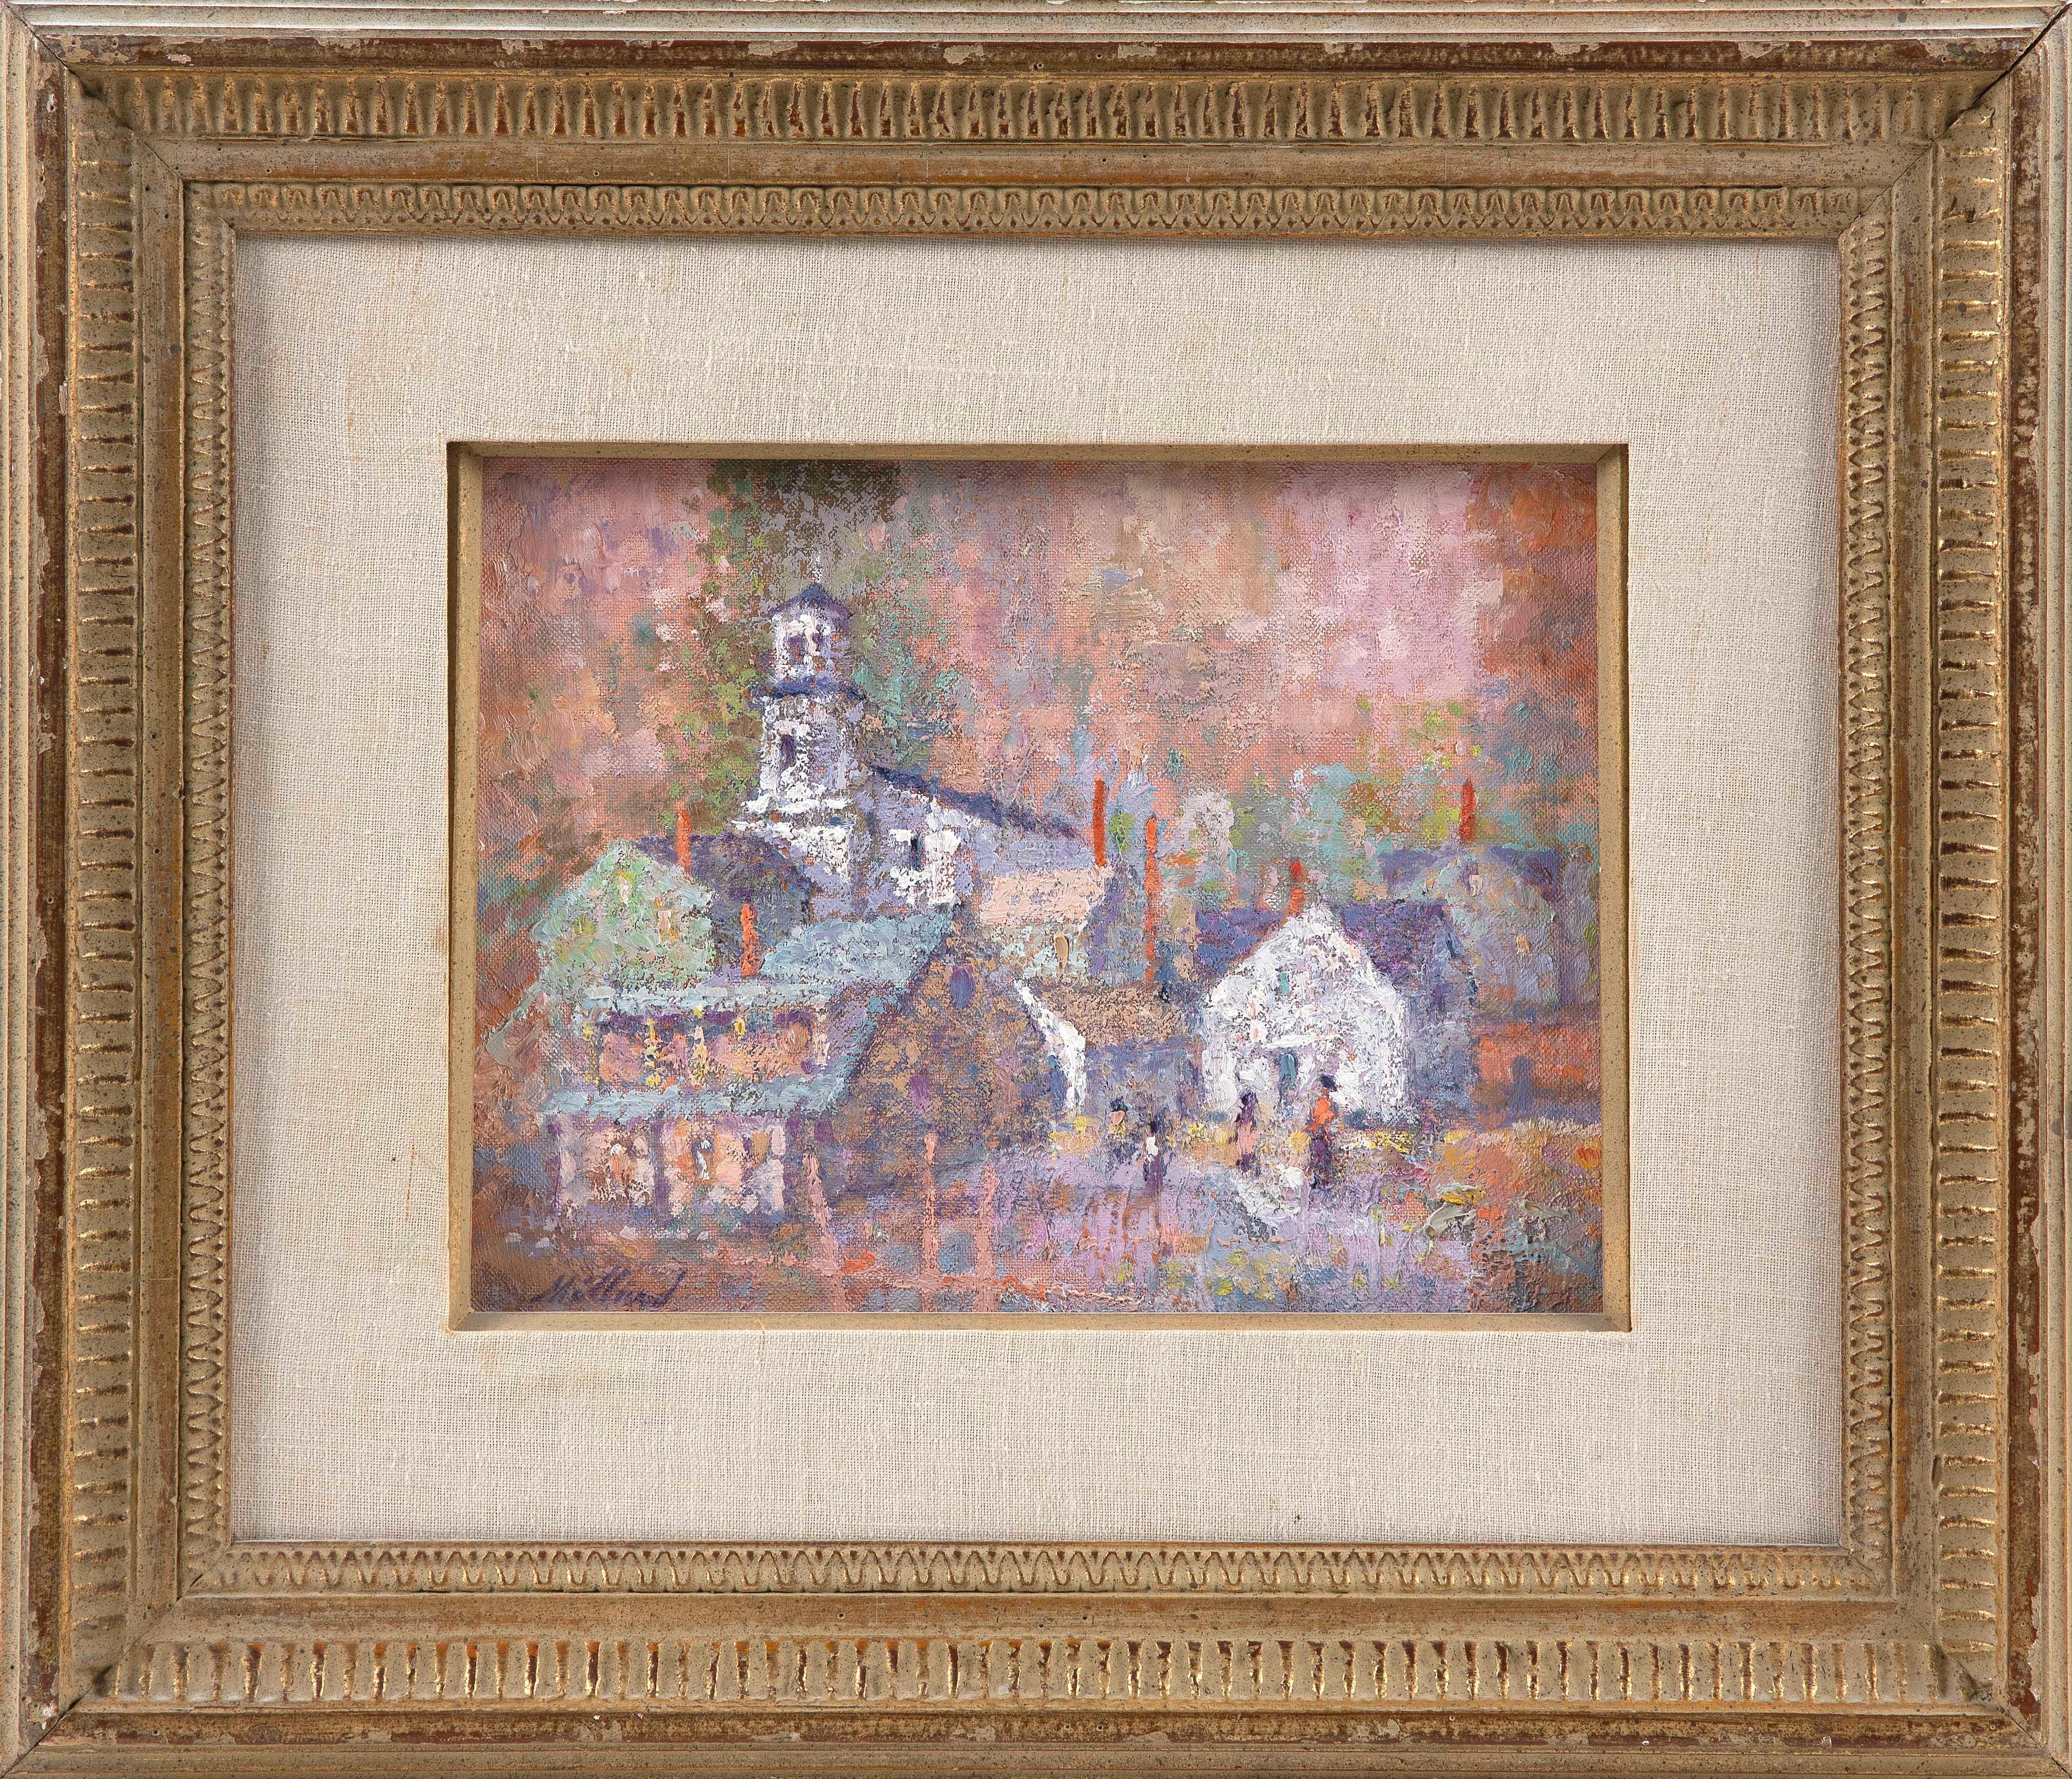 "DAVID L. MILLARD , Massachusetts, 1915-2002, ""Six Chimneys, P-town""., Signed lower left ""Millard"". Titled and dated ""7/7/89"" verso., Oil on board, 9"" x 12"". Framed 17"" x 21""."